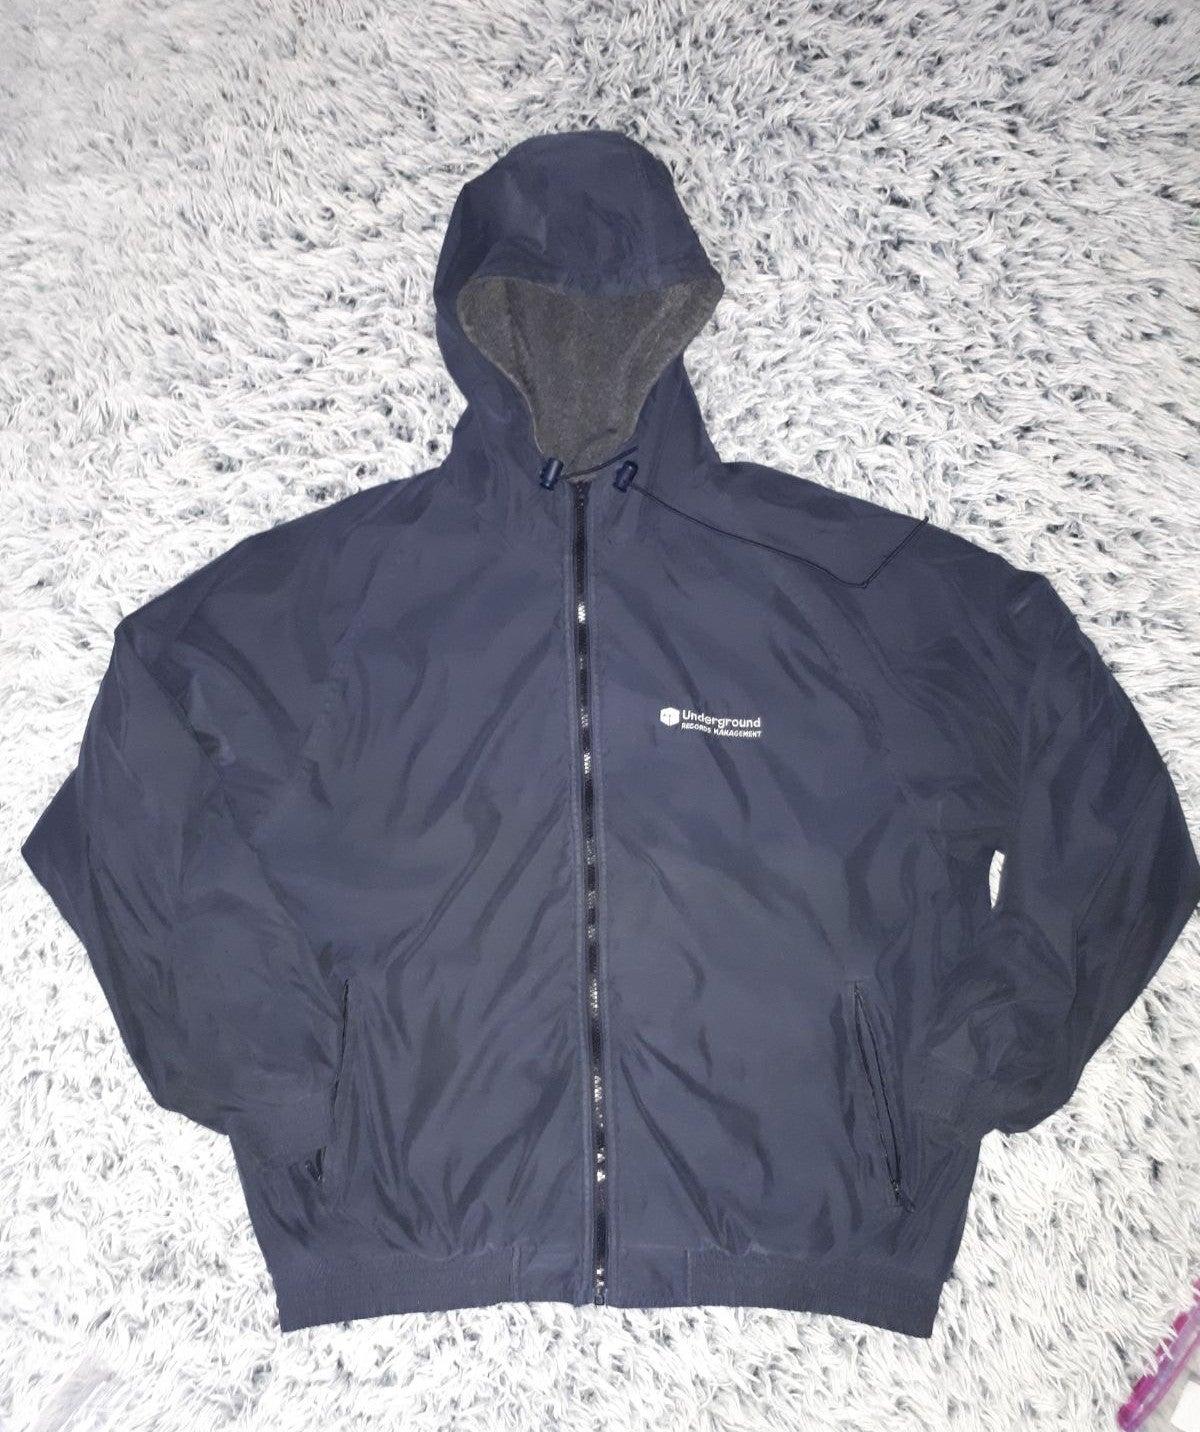 Weatherproof winter jacket XXL.